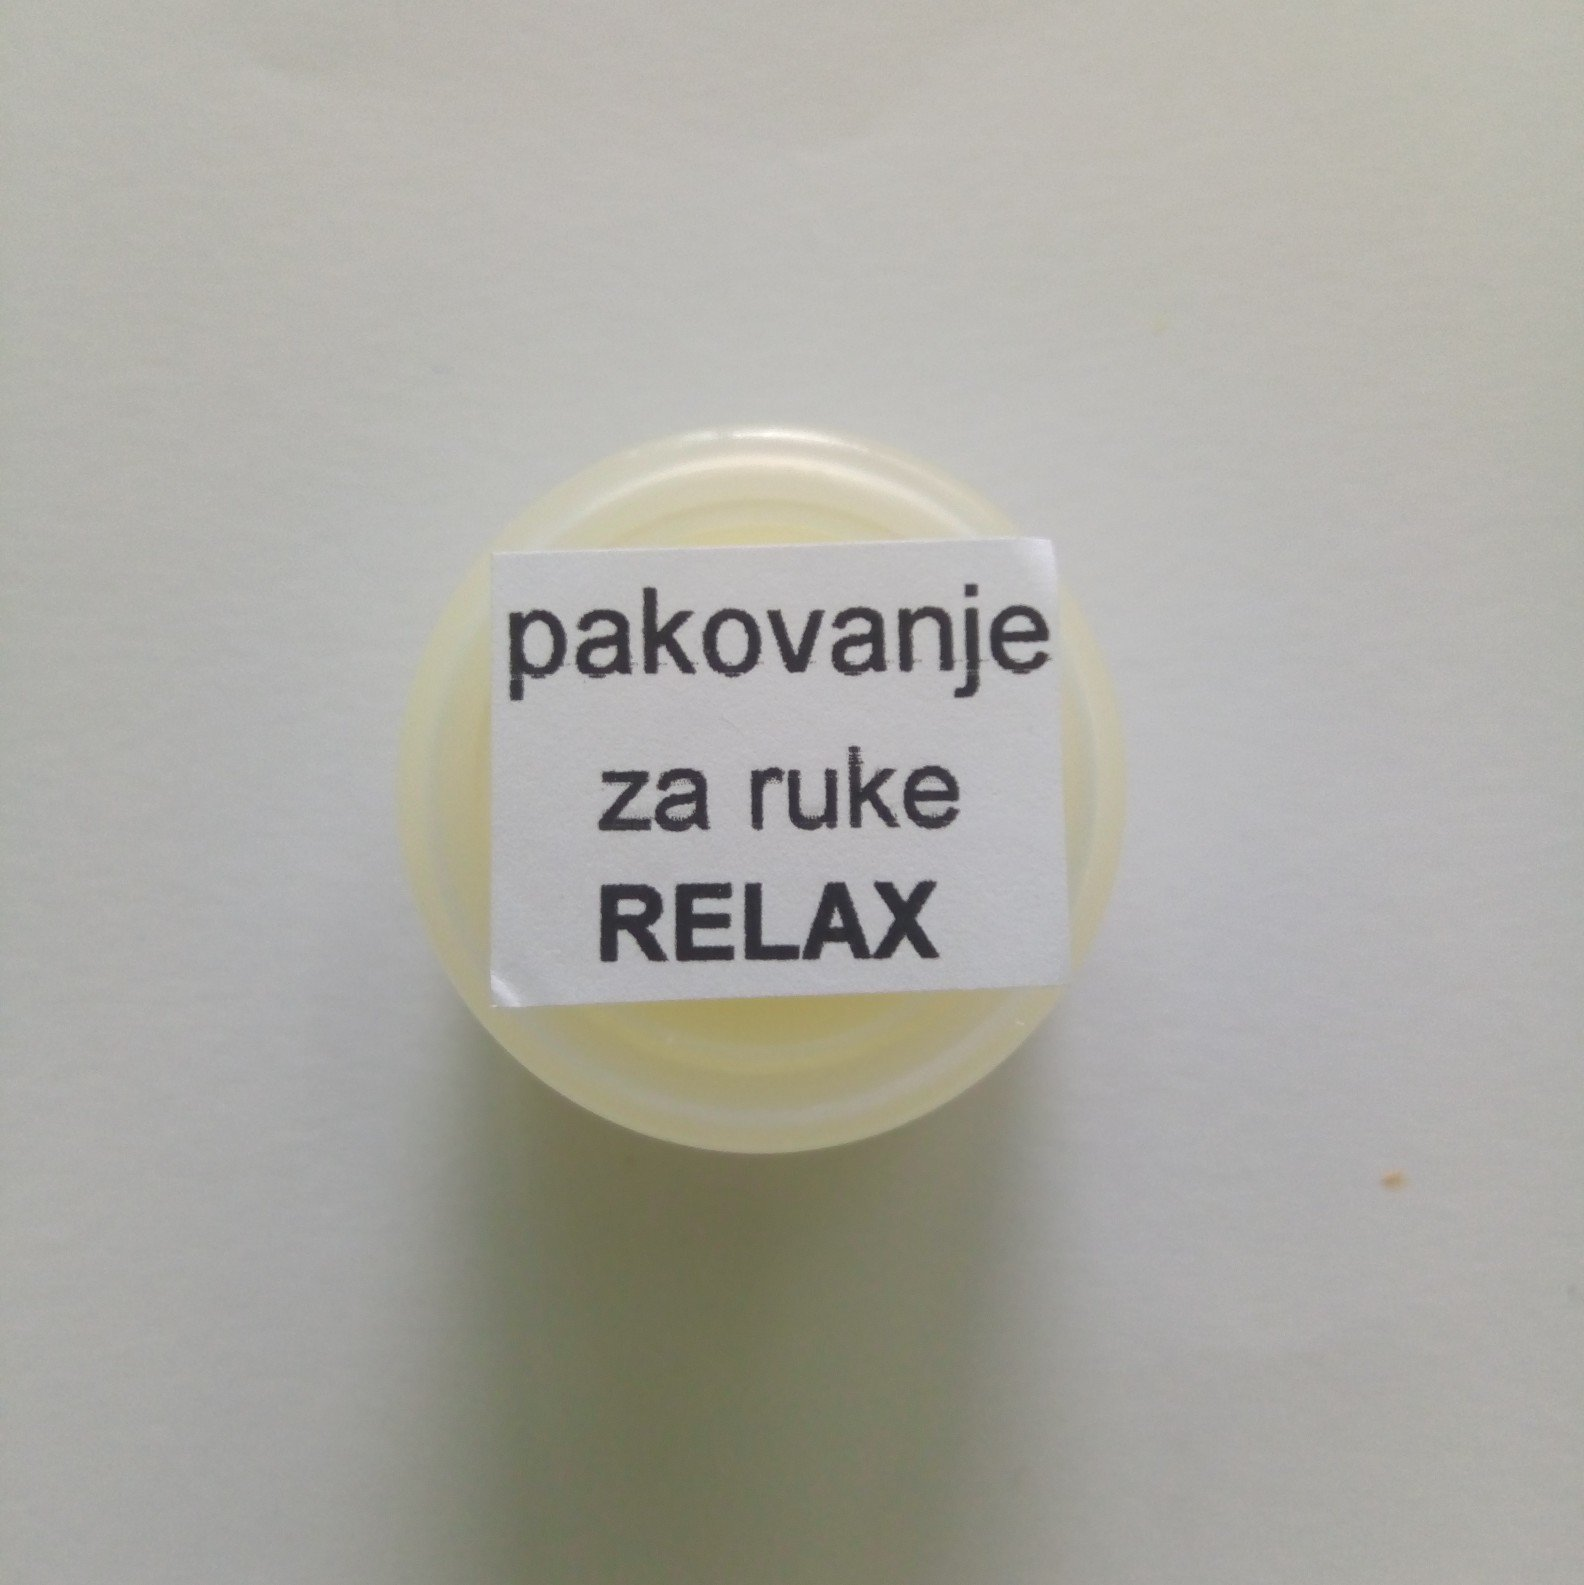 Herbateria - Tester pakovanje za ruke relax 5 ml 00444